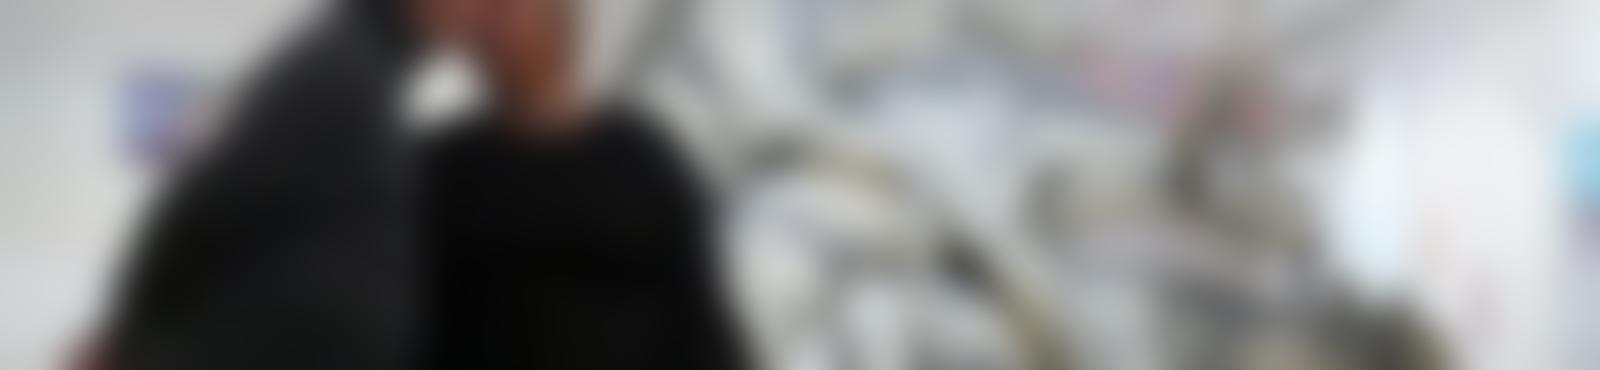 Blurred ef62cde6 172f 4425 9c9b aa45c8394c52